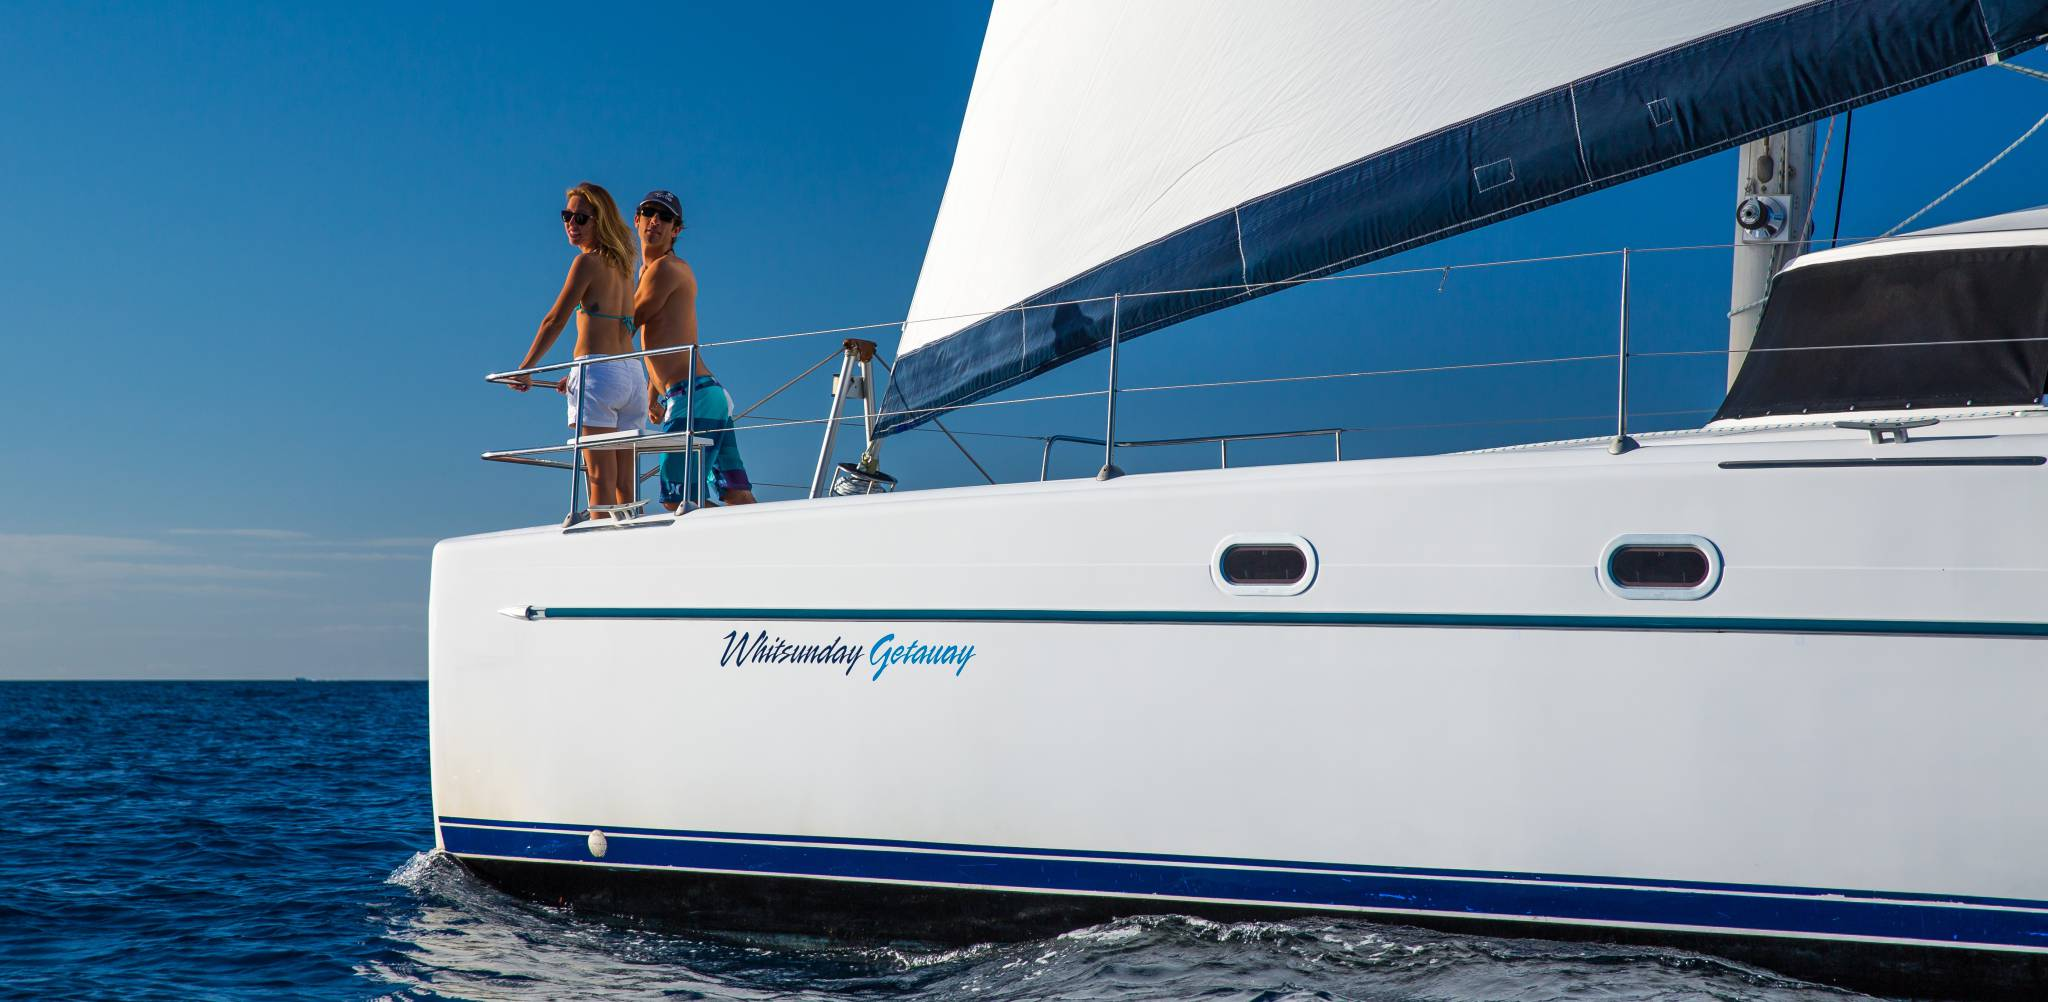 Whitsunday Getaway Catamaran | Whitsunday Holidays